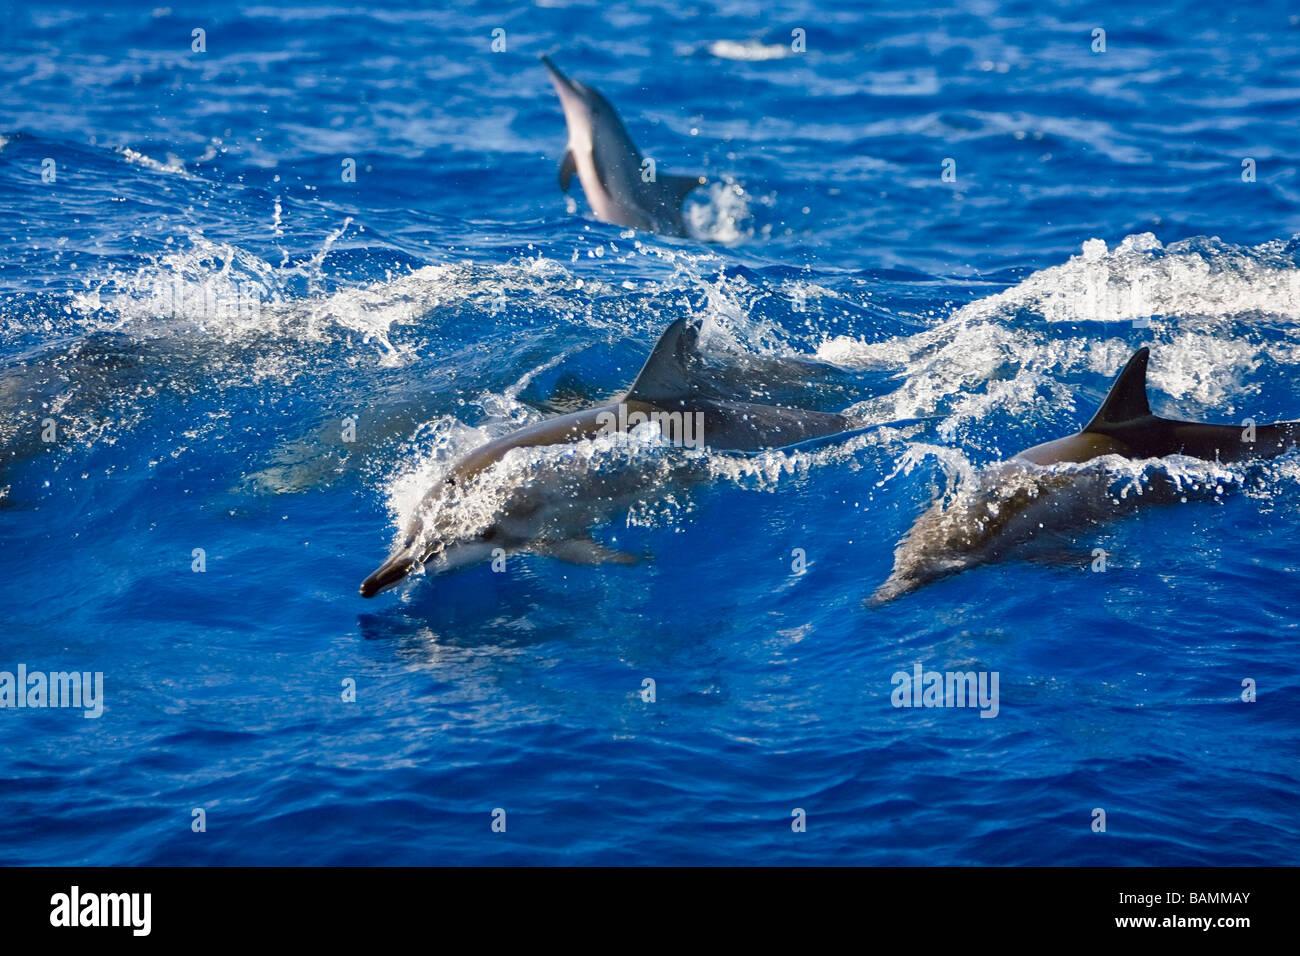 Hawaiian Spinner Dolphin Wave-riding - Stock Image